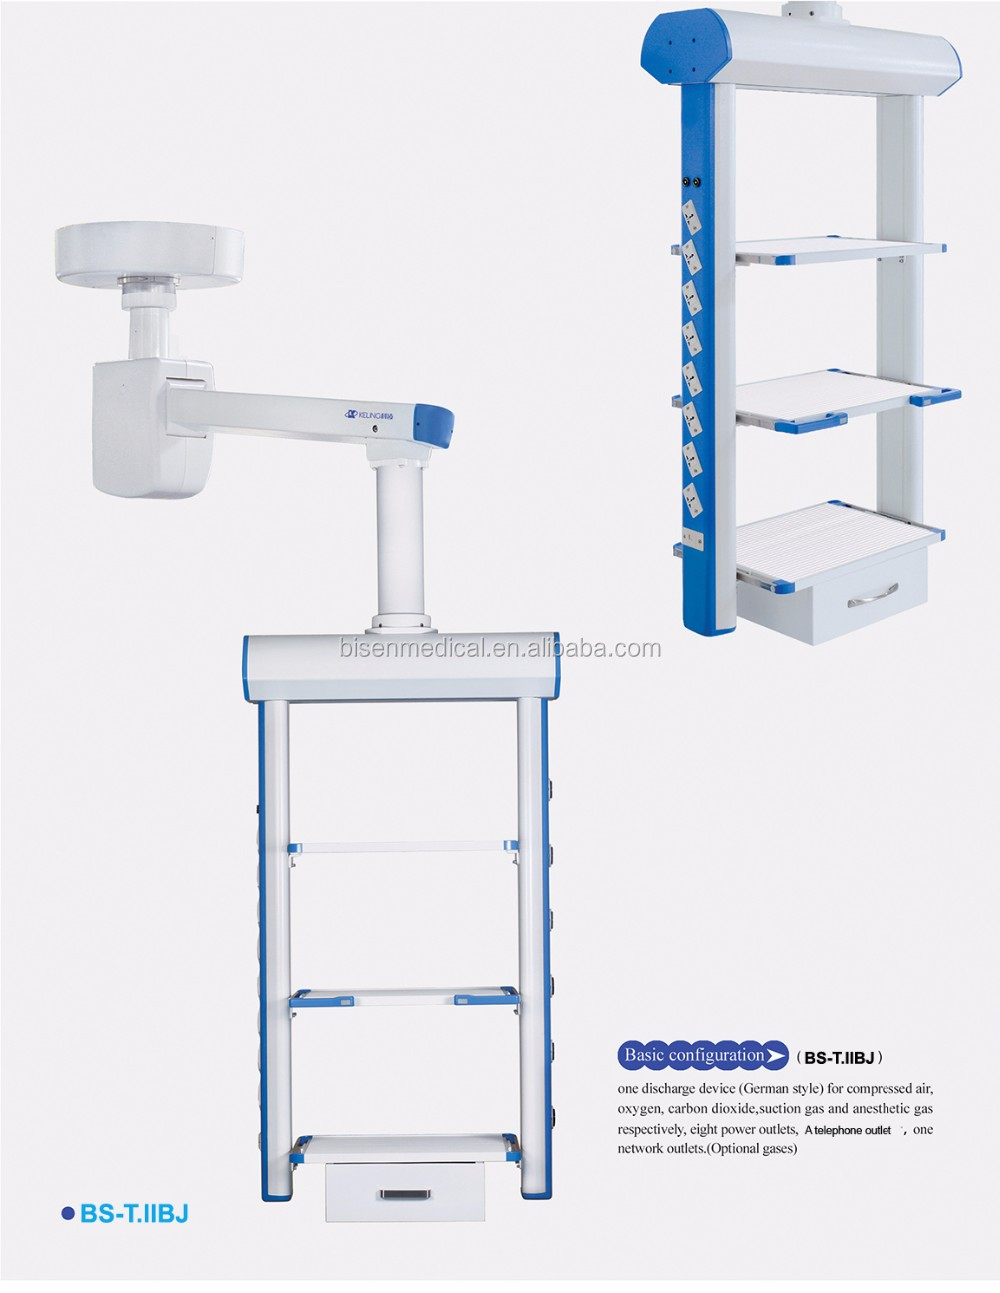 Endoscopic Room: Bs-t.iibj Endoscopic Surgical Ot Pendant Anesthetic